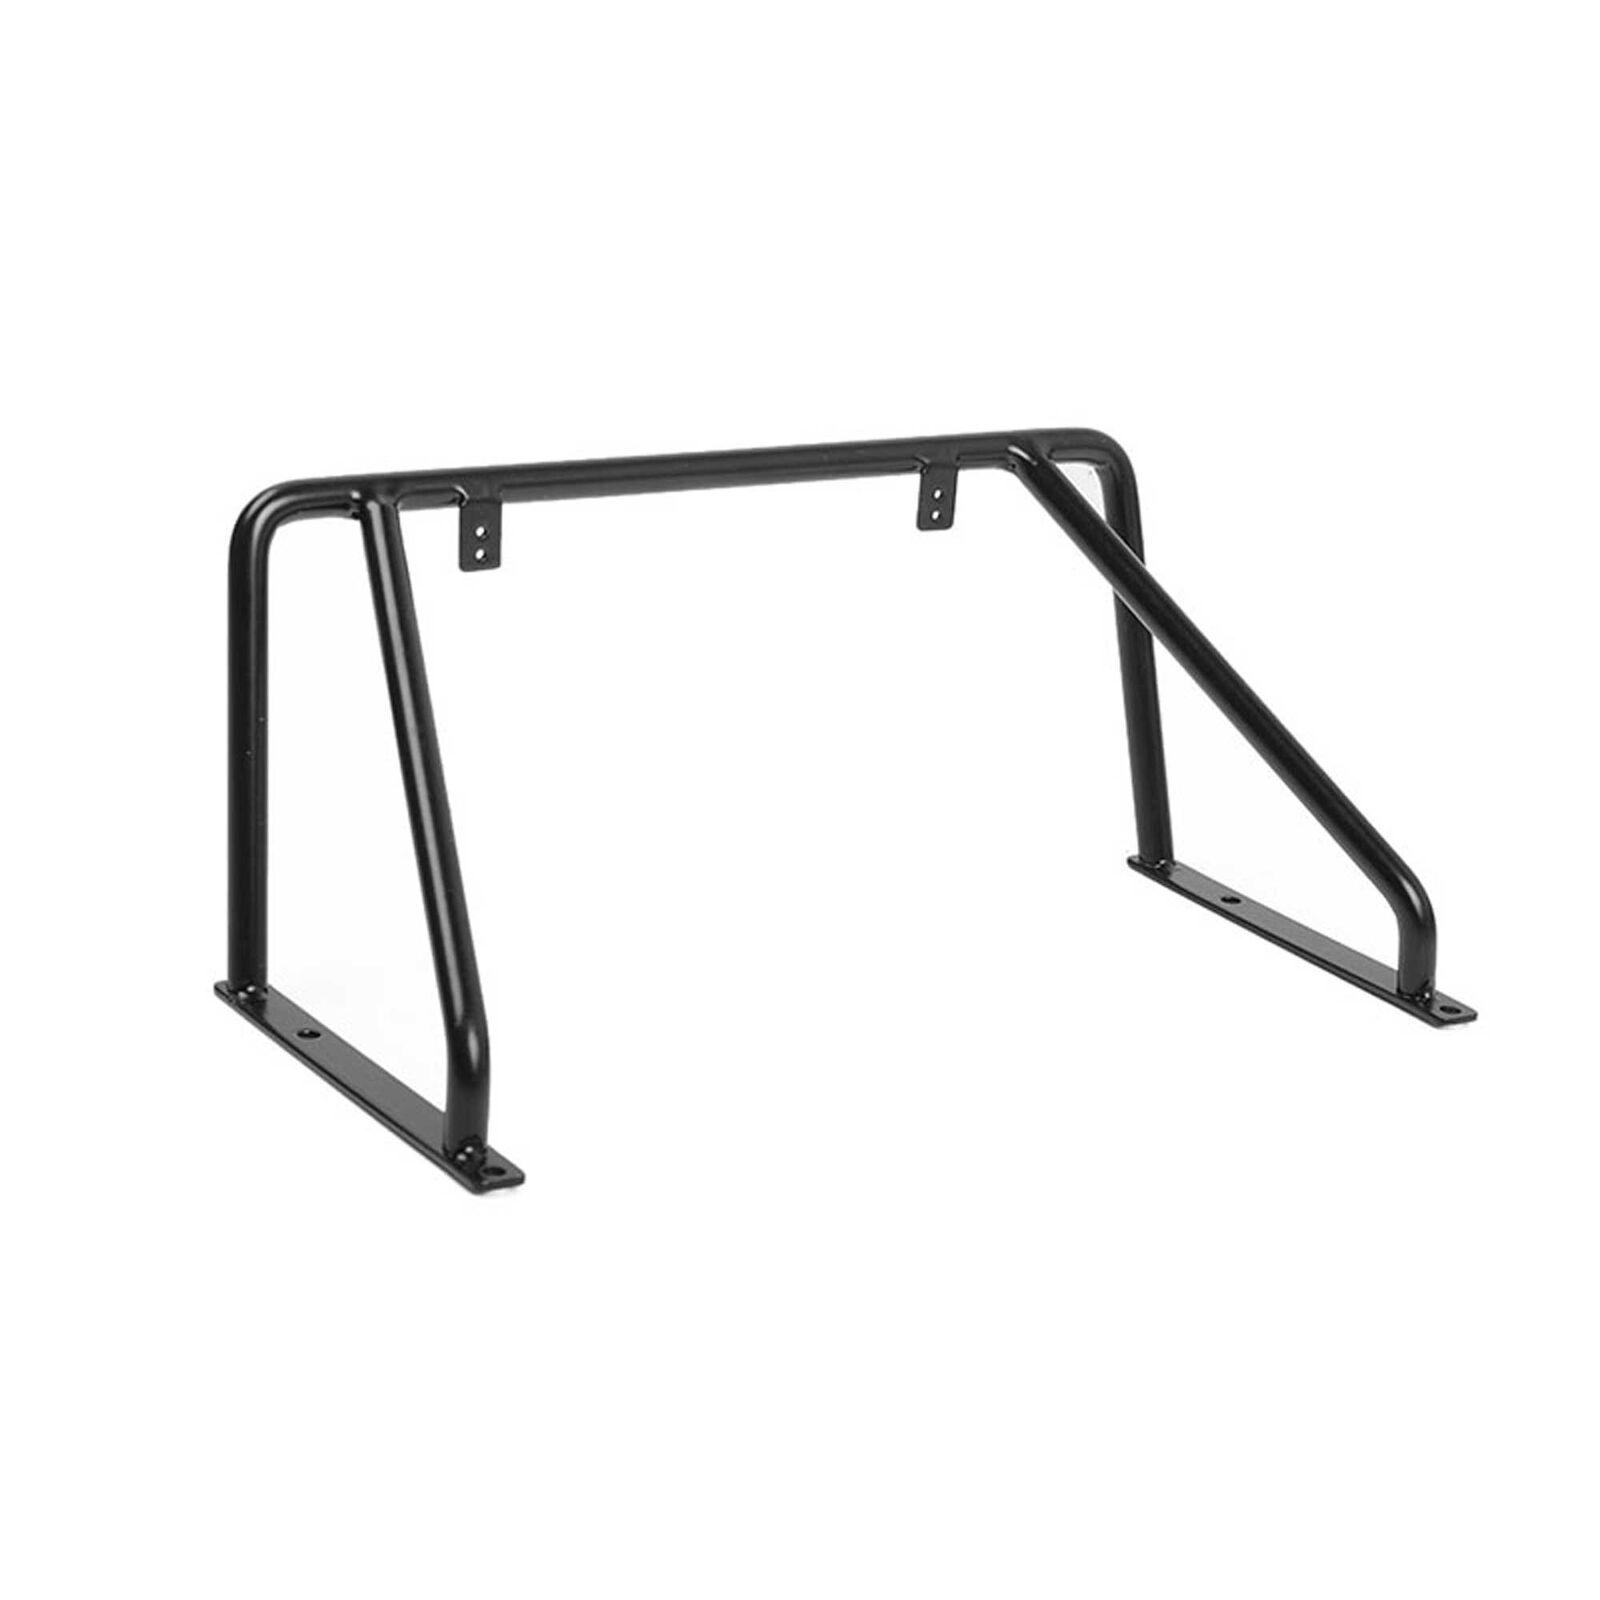 Steel Tube Roll Bar-VS4-10 Origin Halfcab Black